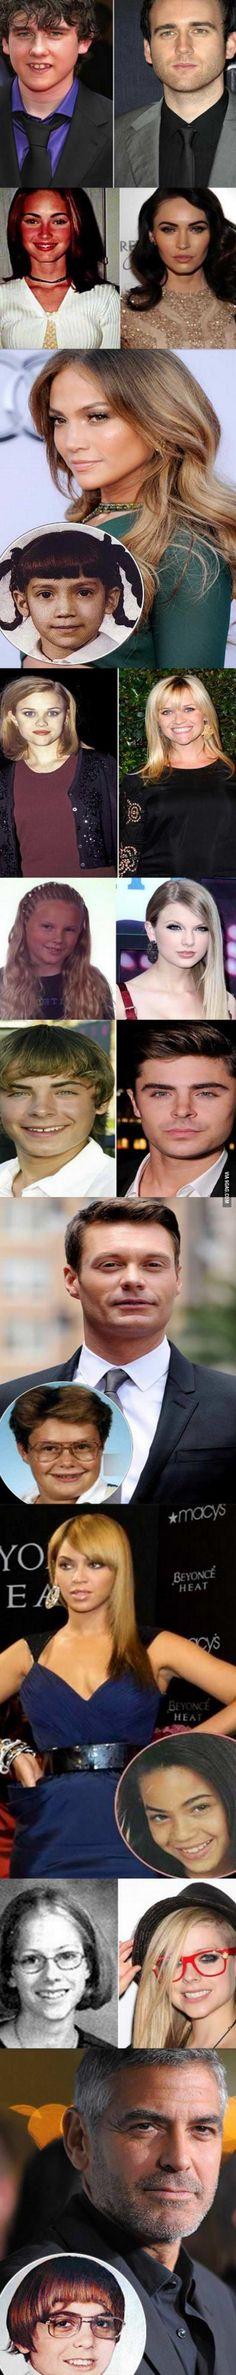 Pictures of Celebrities – Then vs. Now